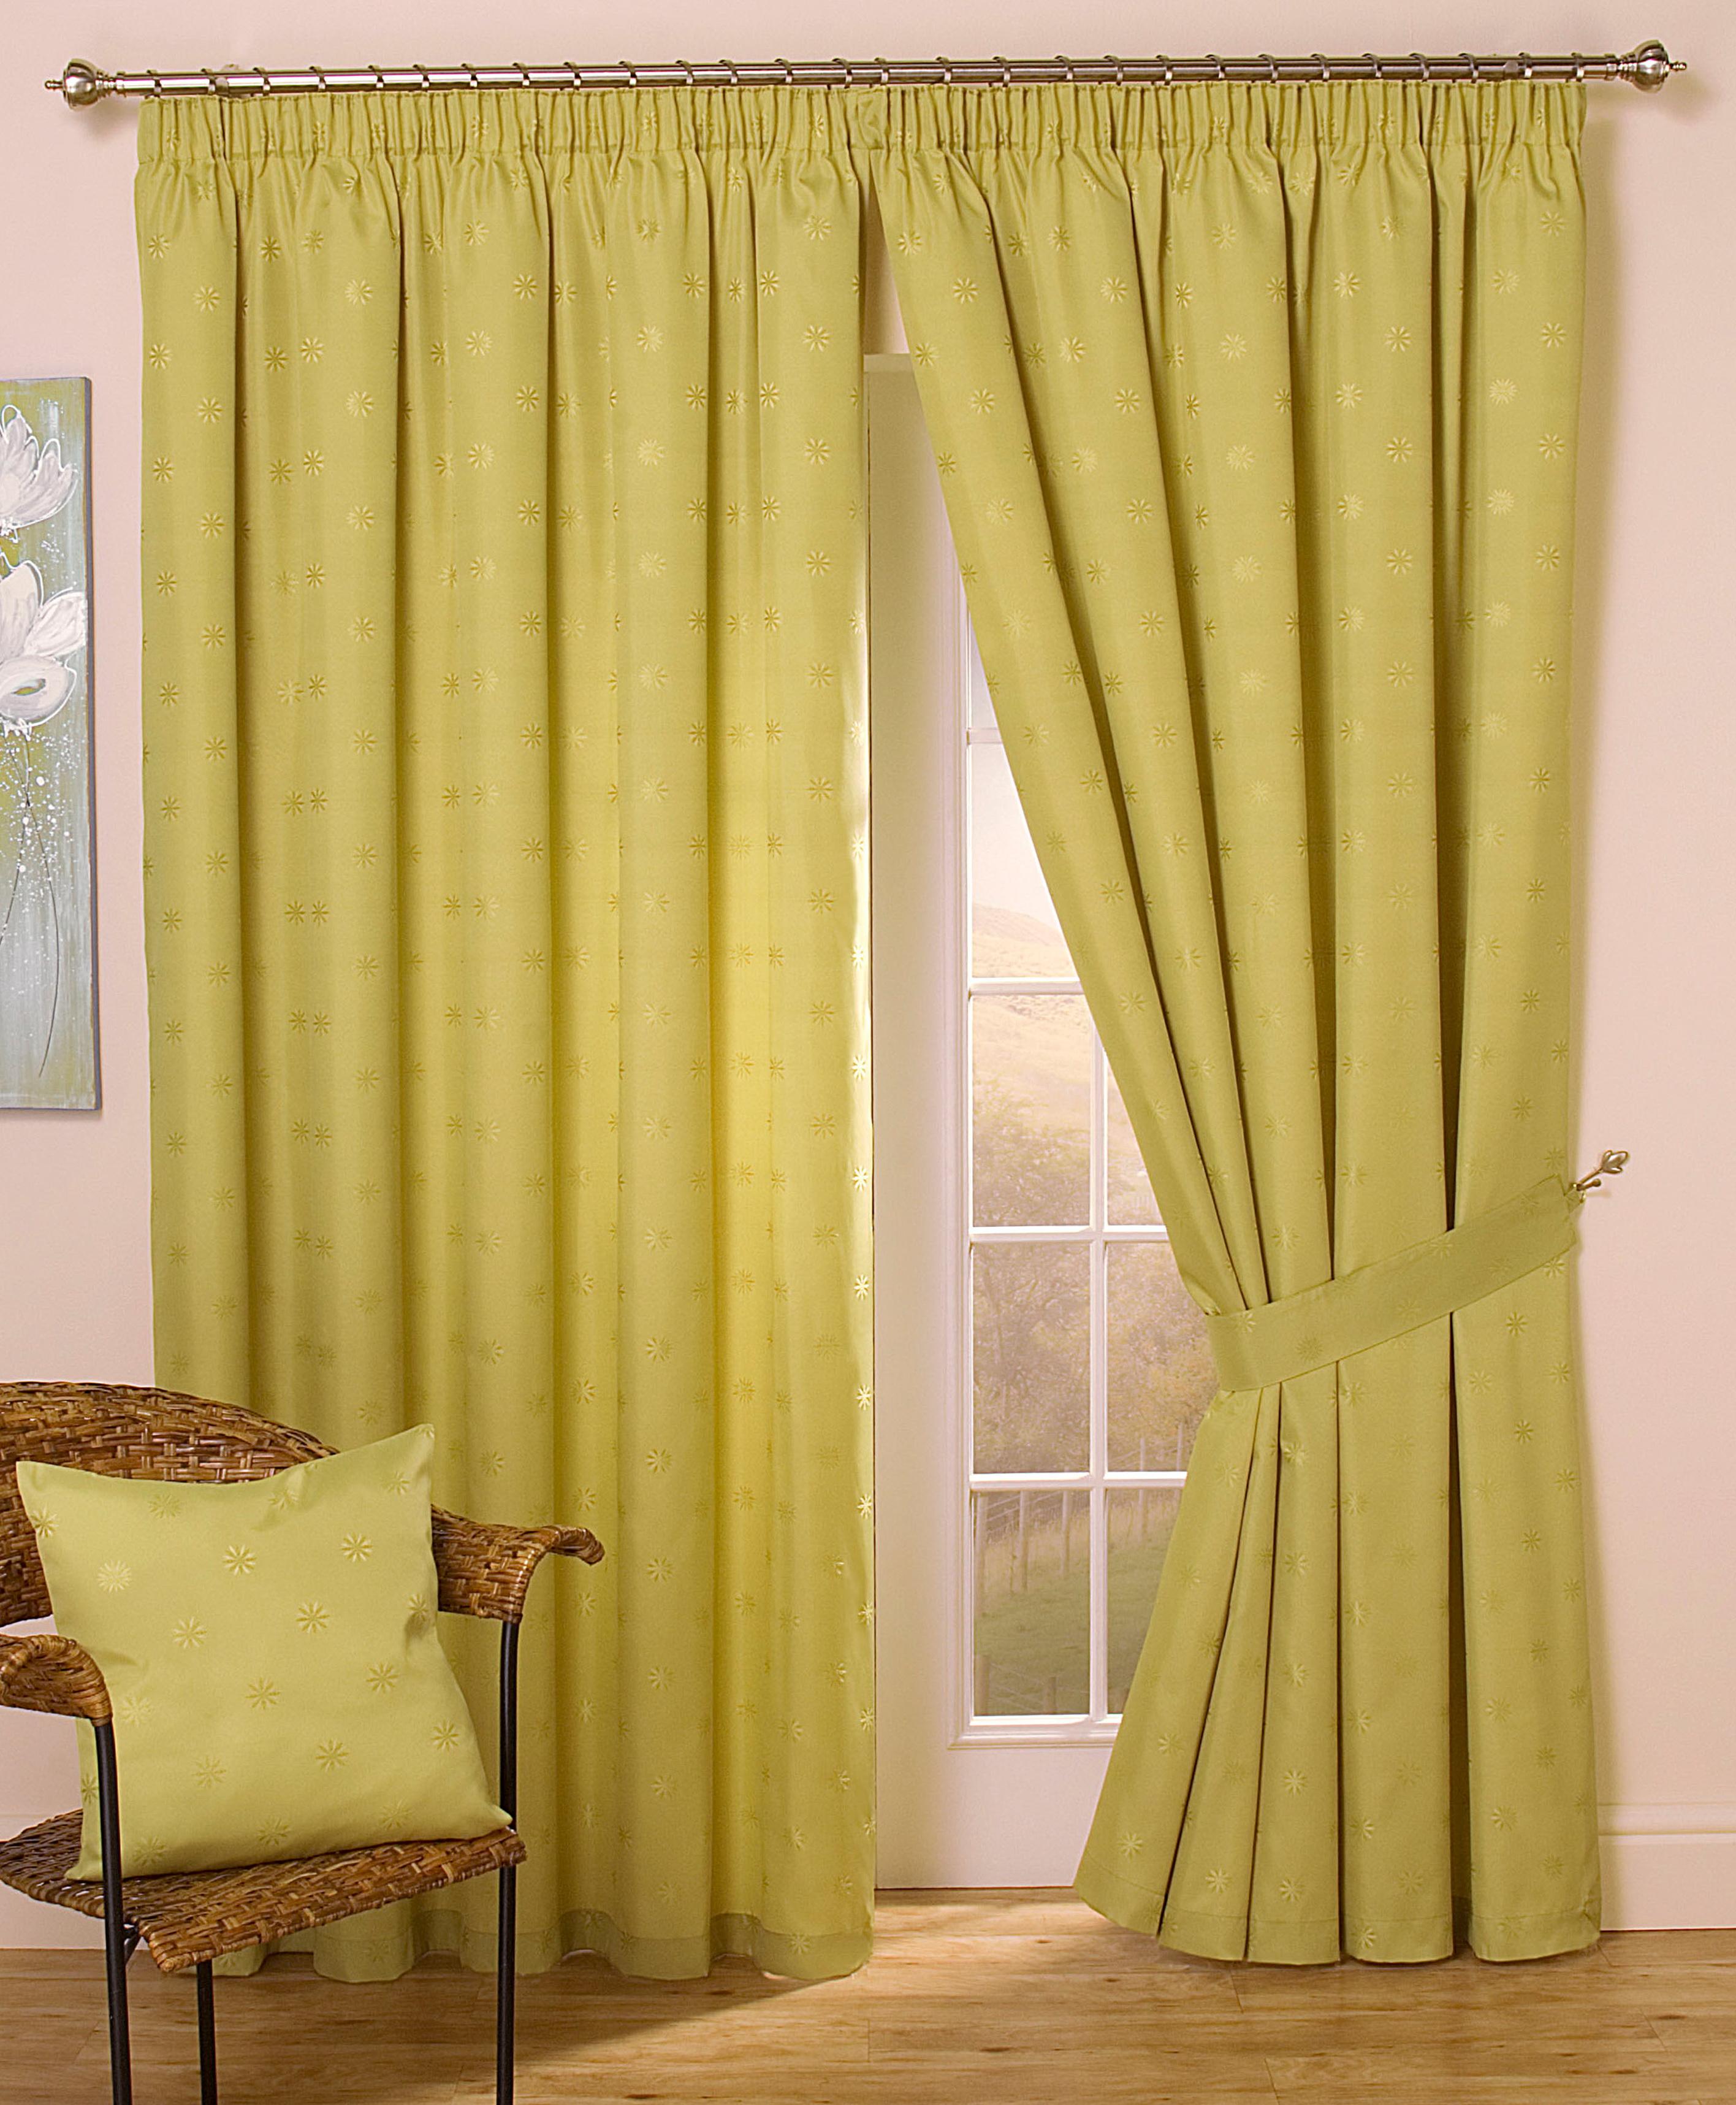 Thermal Curtain Panels Cheap Home Design Ideas